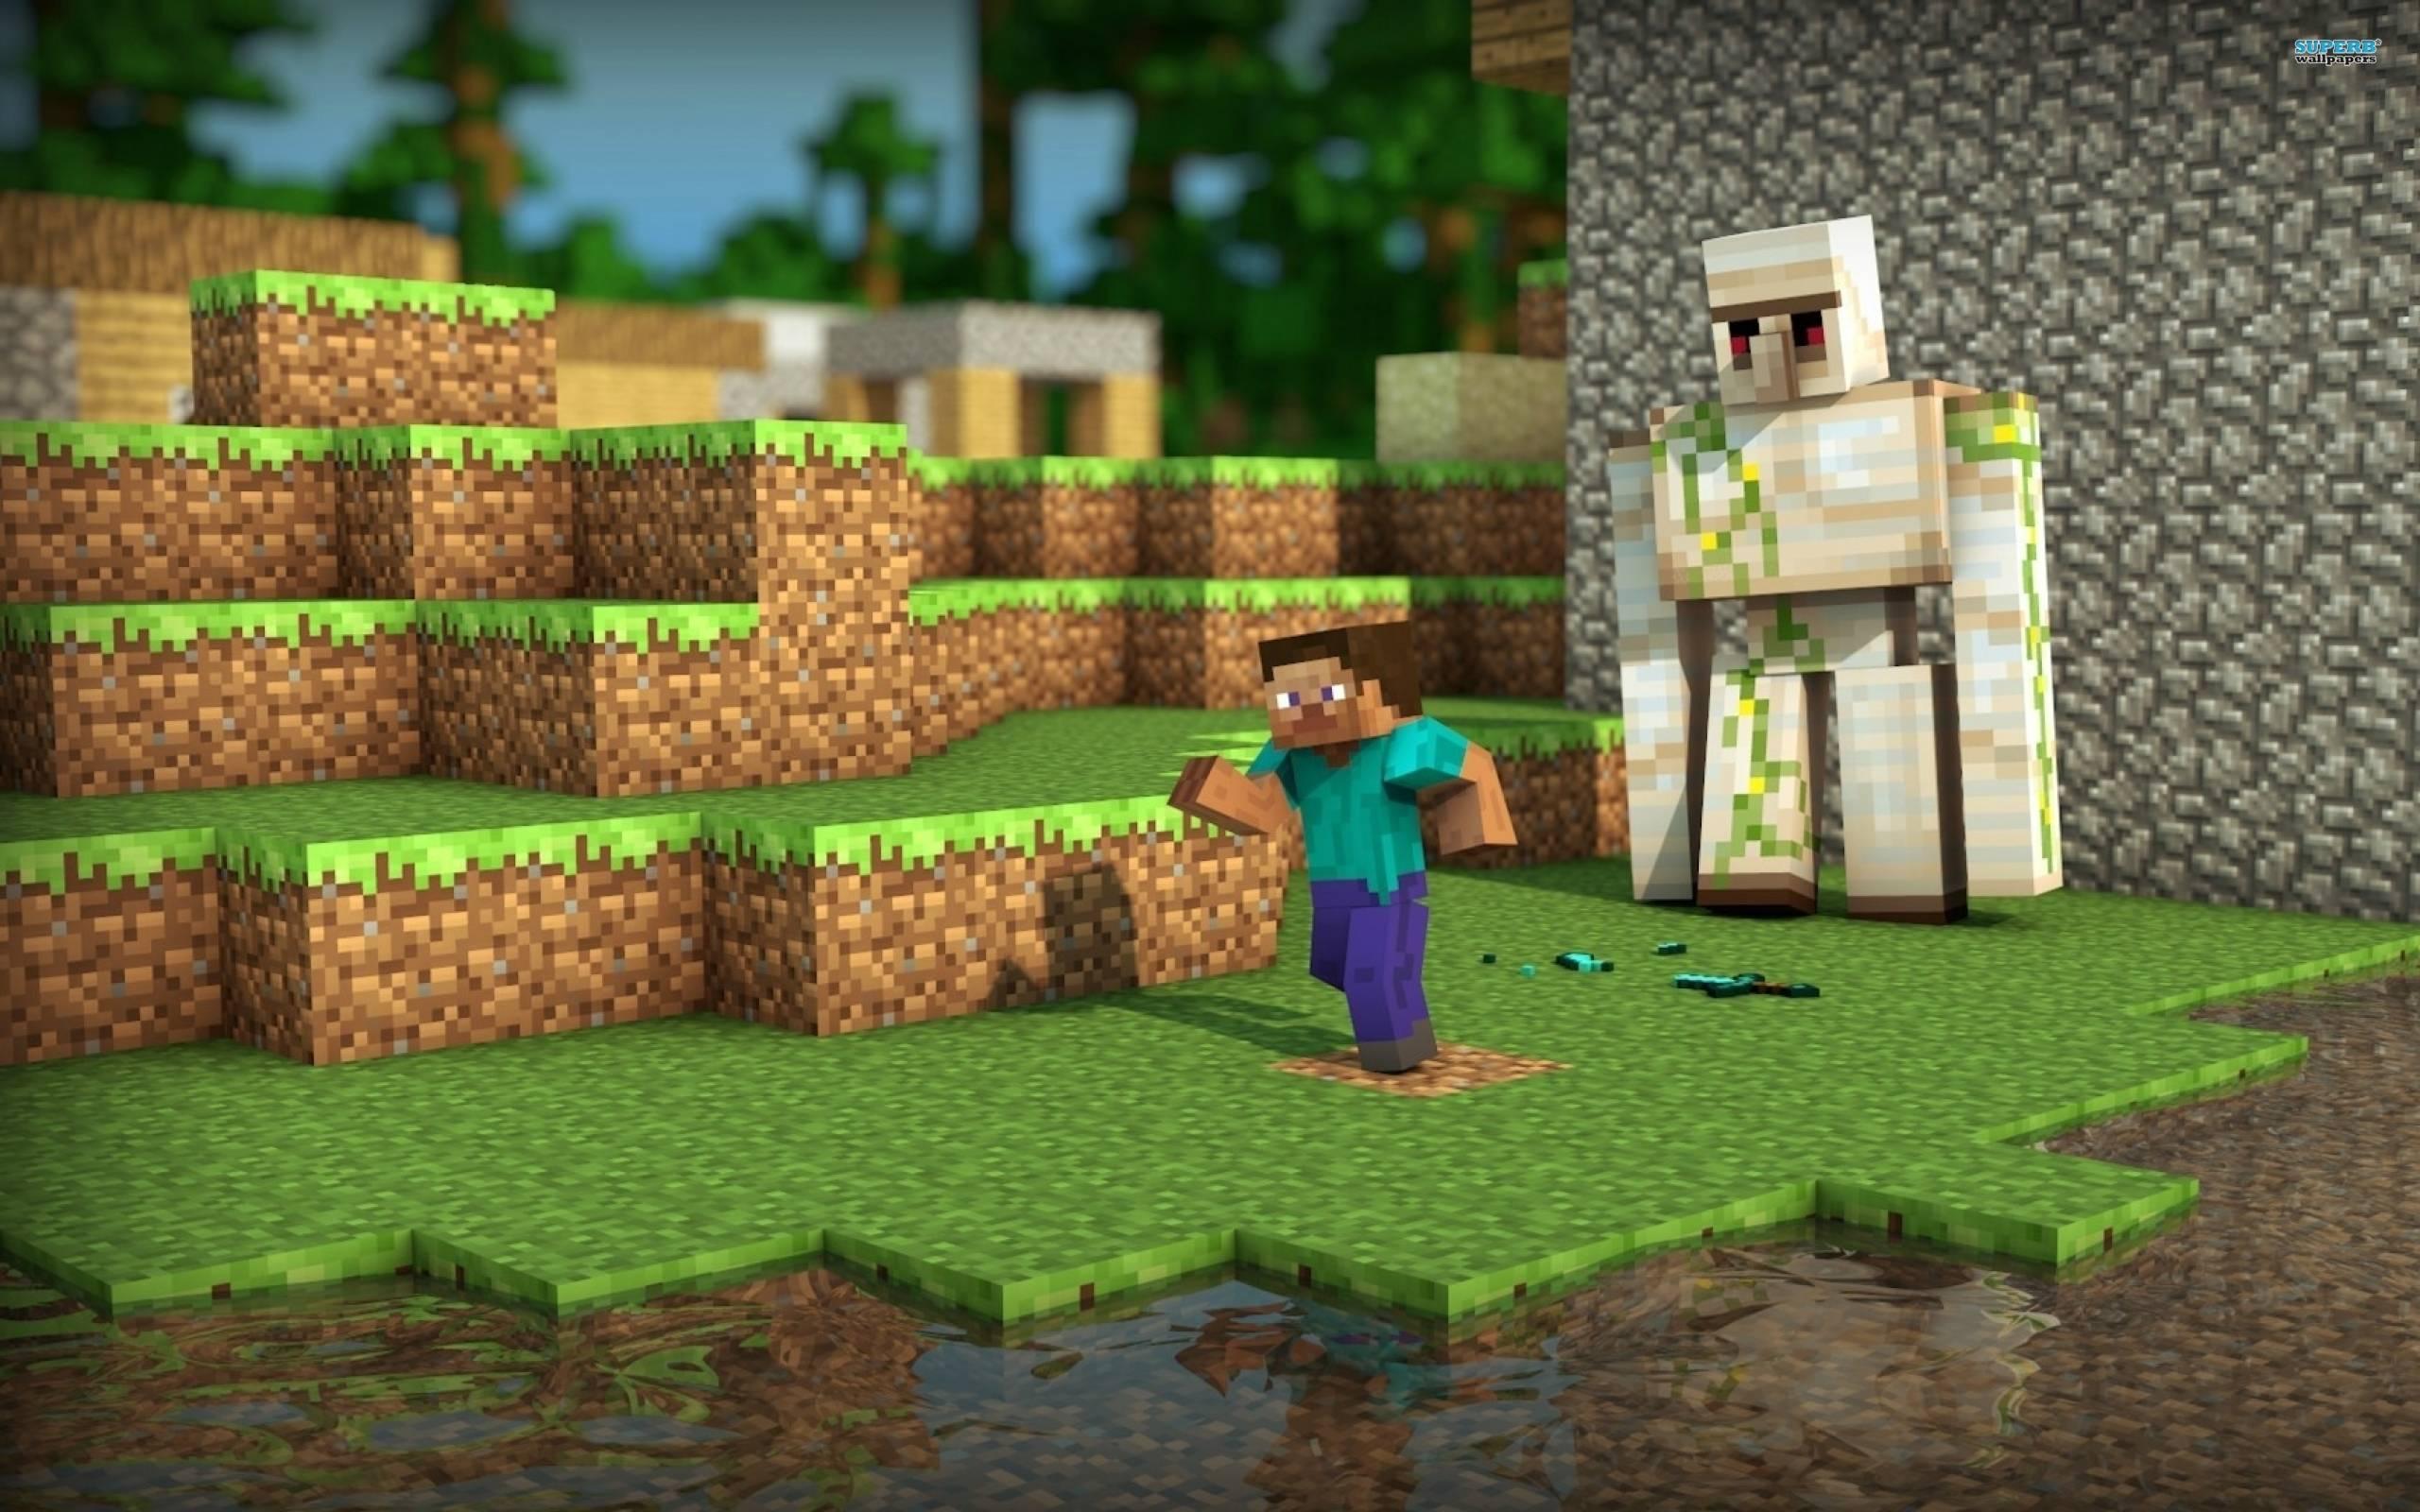 Minecraft Wallpapers - Wallpaper Cave